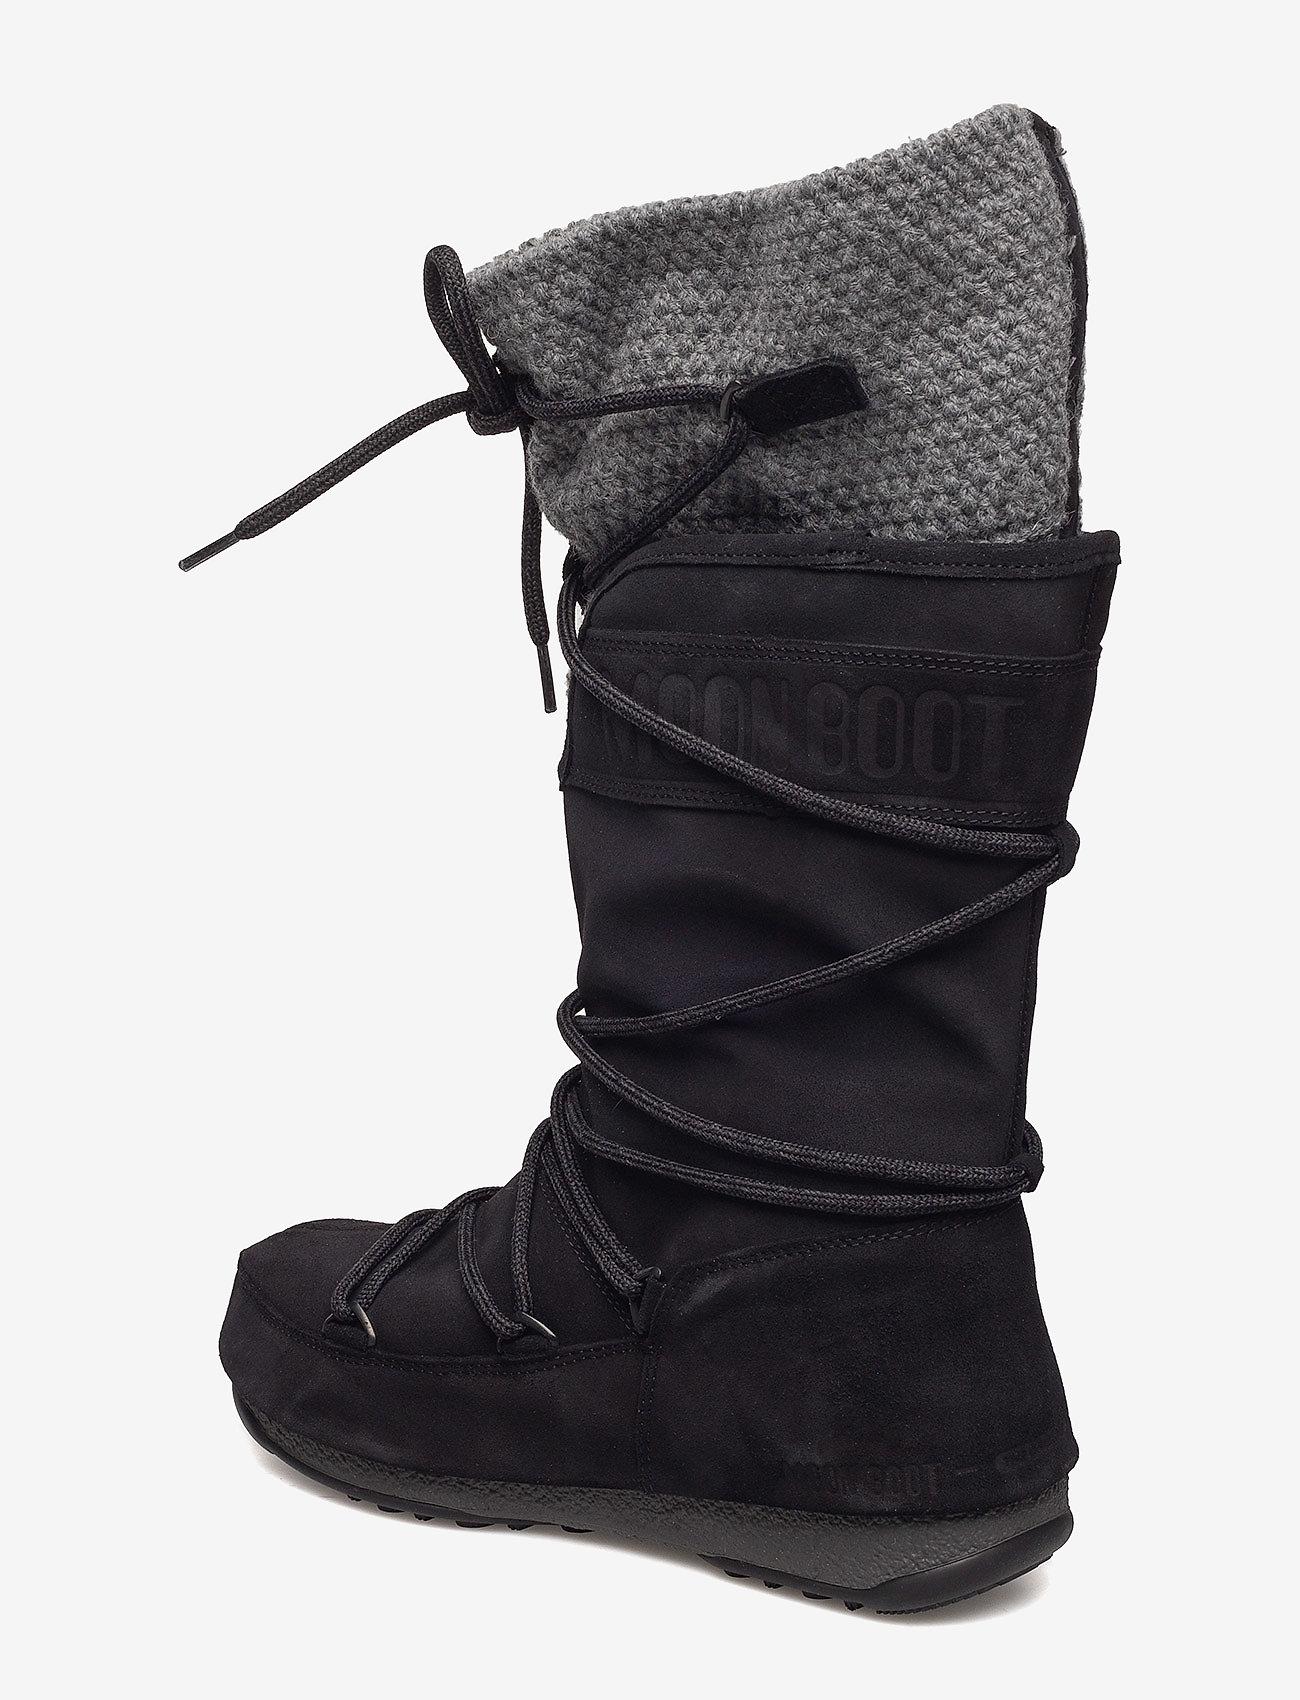 Moon Boot W.e. Anversa Wool Wp (Black-grey) - Moon Boot